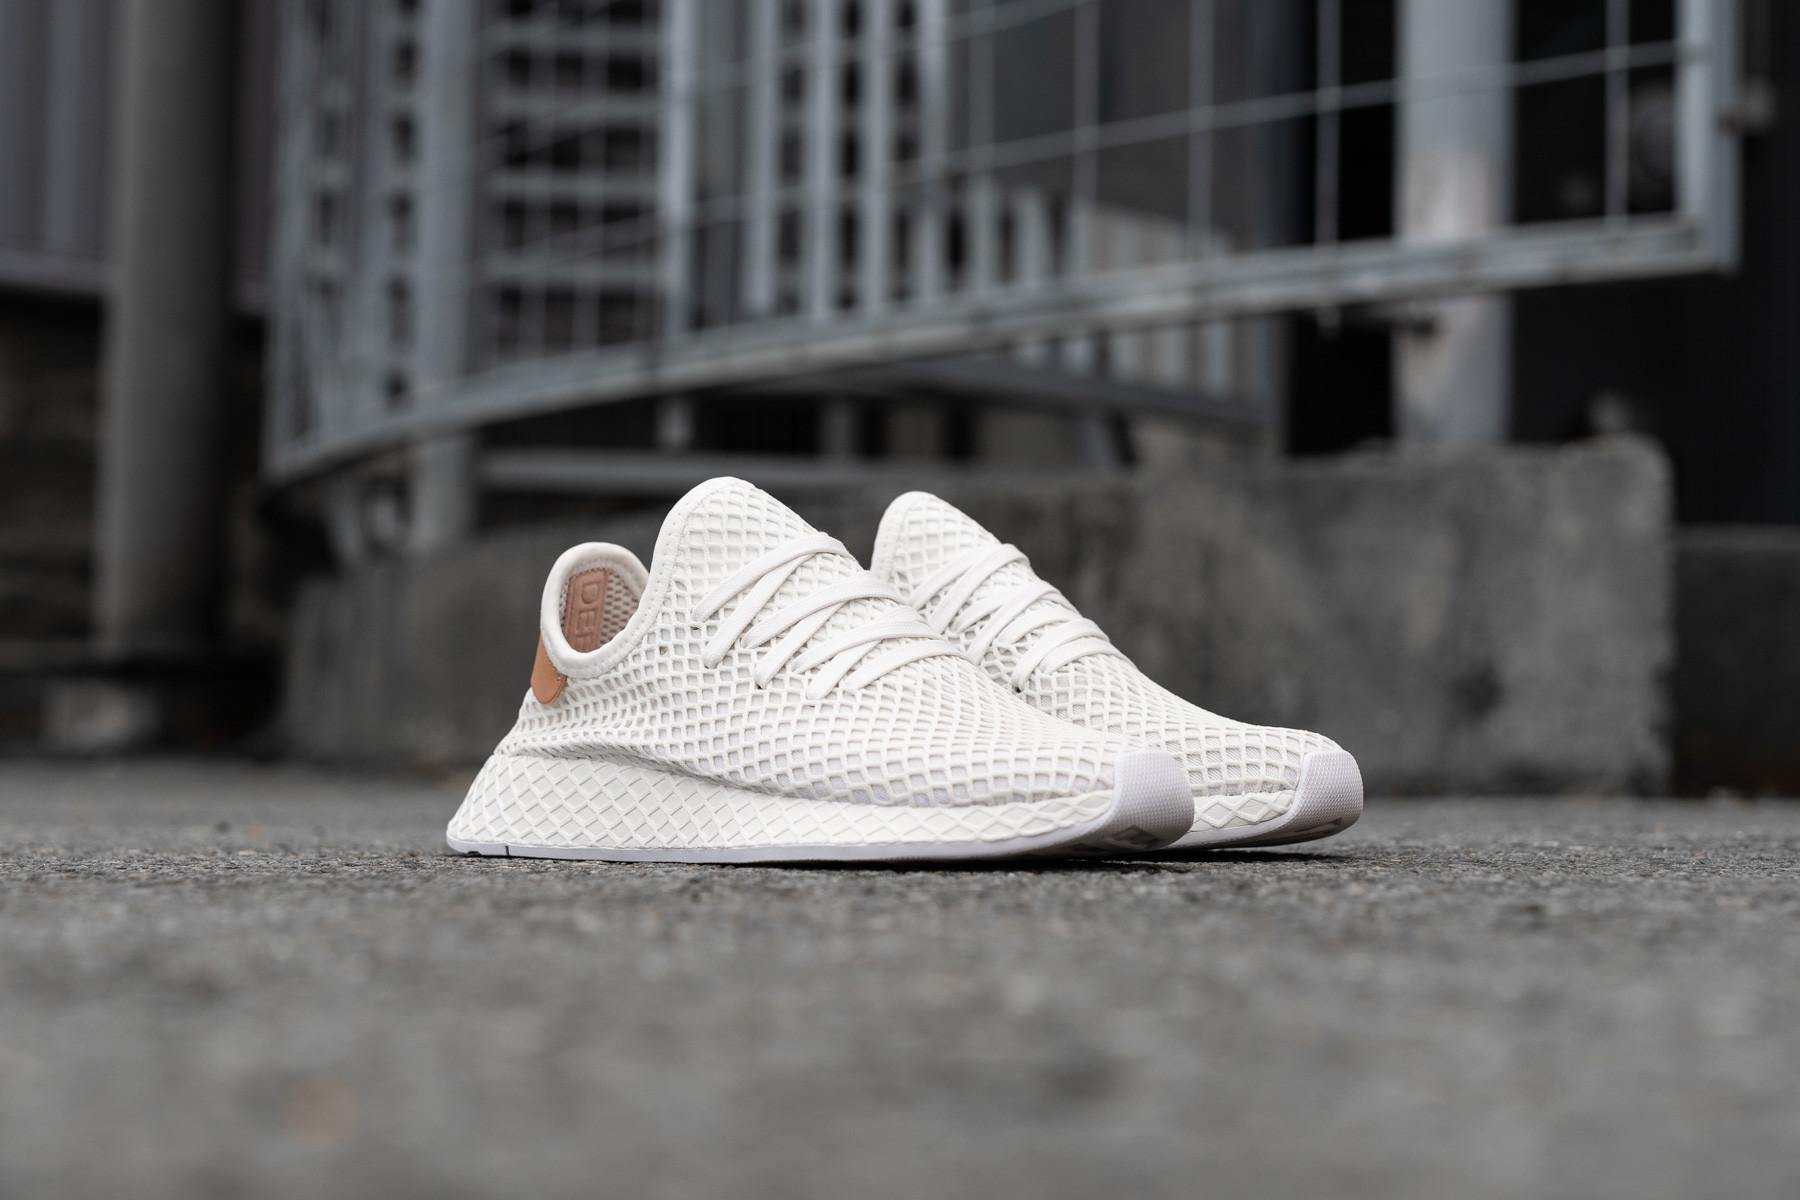 pick up 903f4 5fa47 Adidas Deerupt Runner - Herre - Sneakers - Sneaker.no